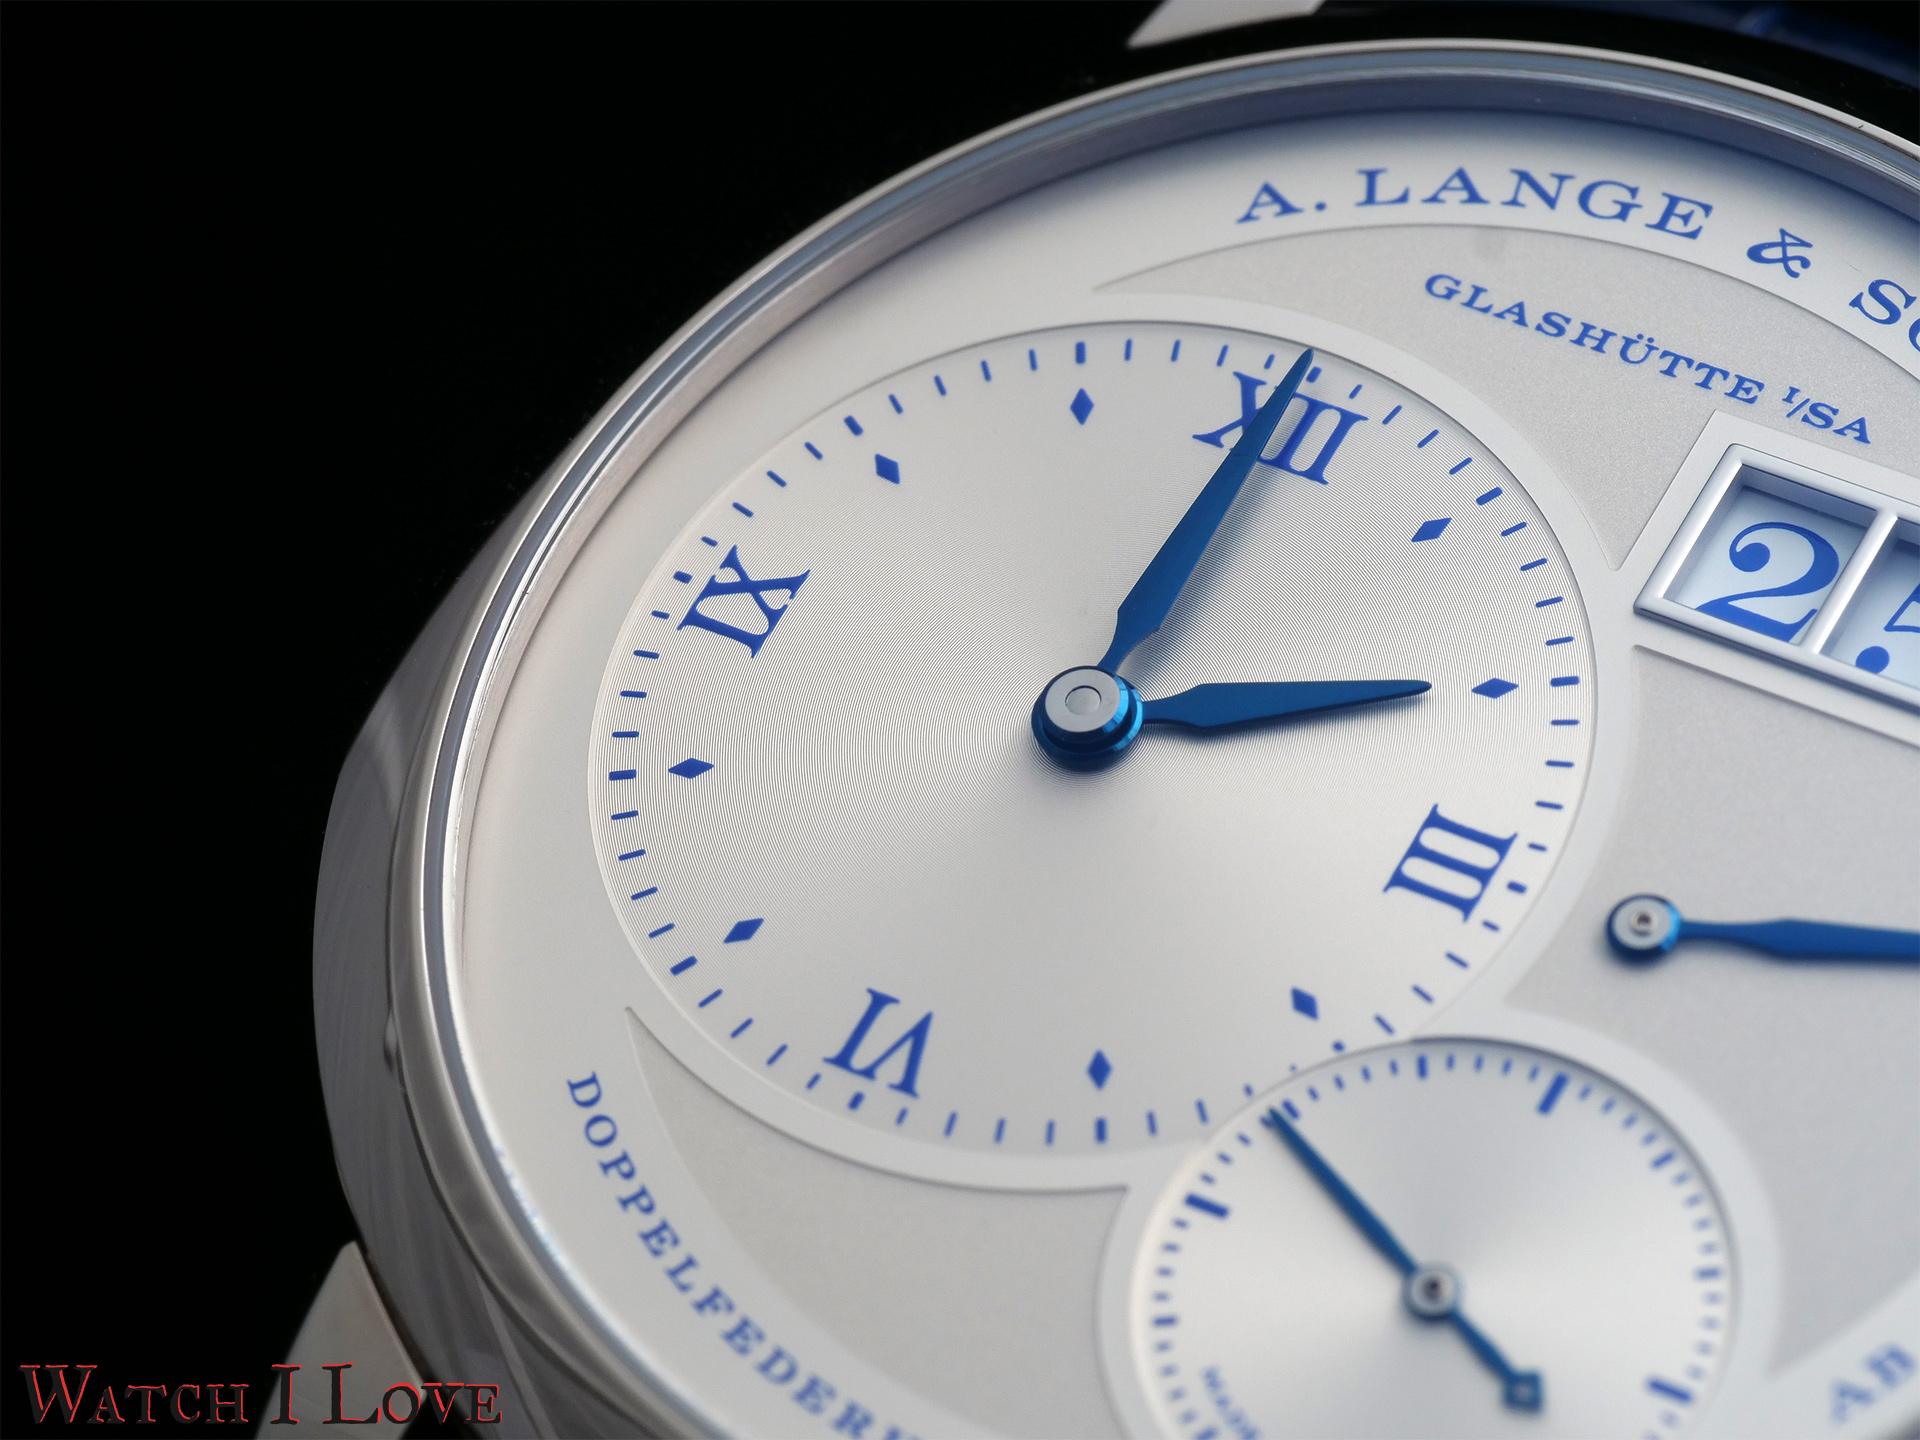 A. Lange Soehne LANGE 1 25th Anniversary time sub-dial